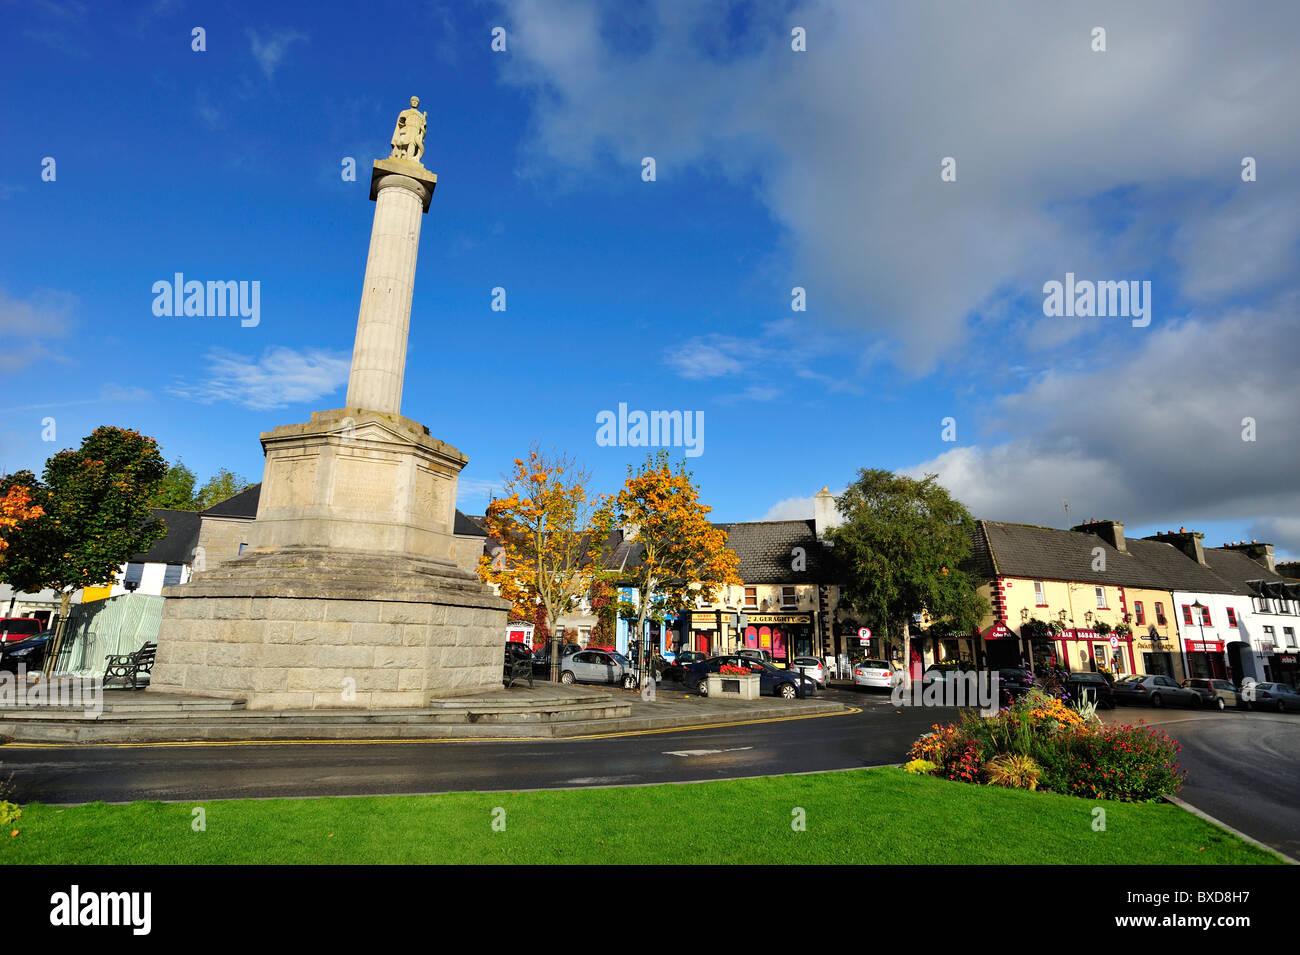 e0e18f3a3d0ce Octagon, Westport, County Mayo, Connacht, Republic of Ireland - Stock Image